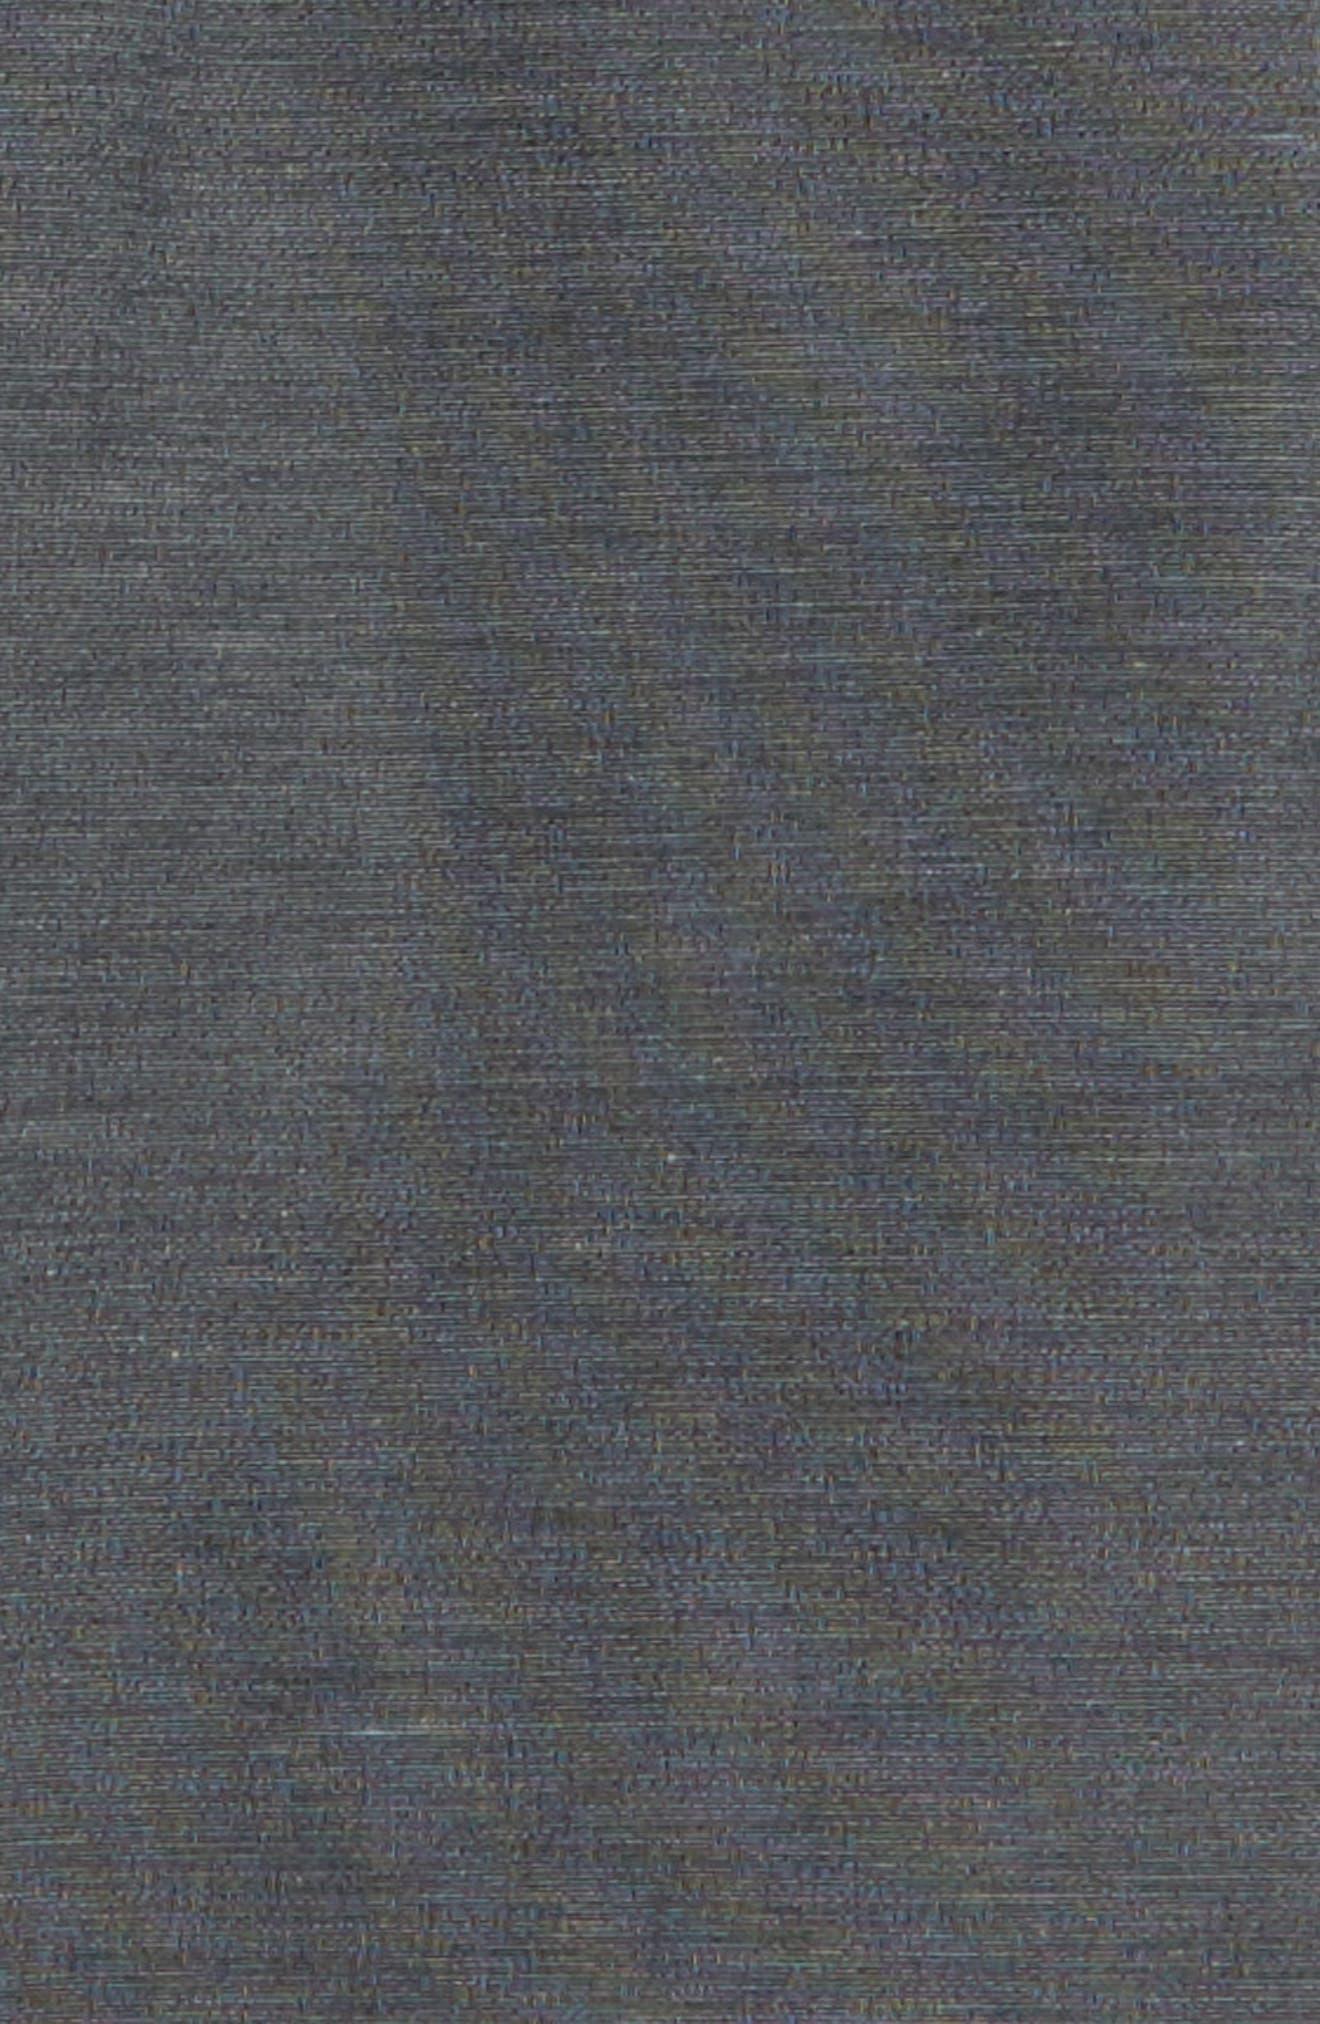 Amphibian Hybrid Shorts,                             Alternate thumbnail 7, color,